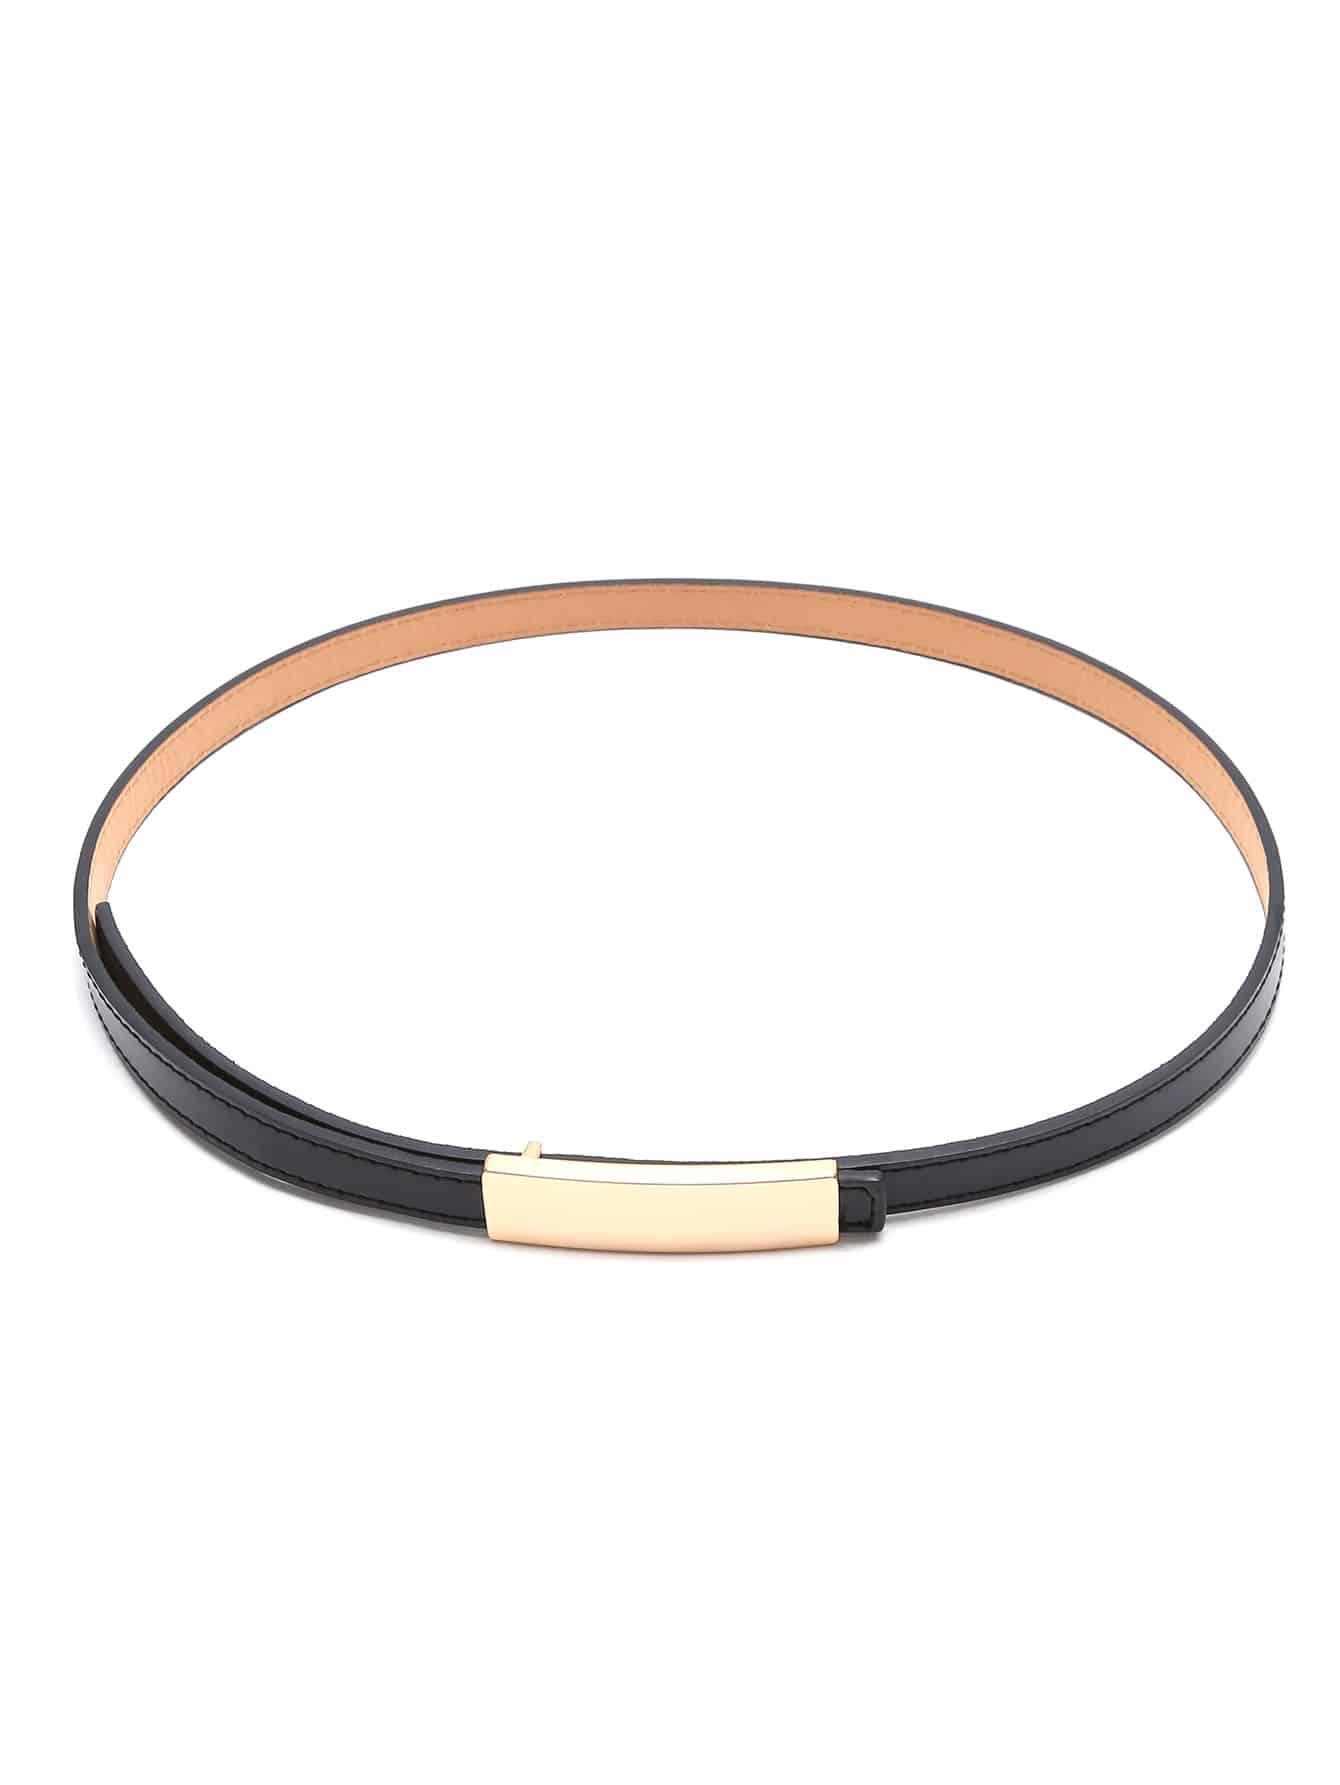 Black Golden Buckle Faux Leather Skinny Belt